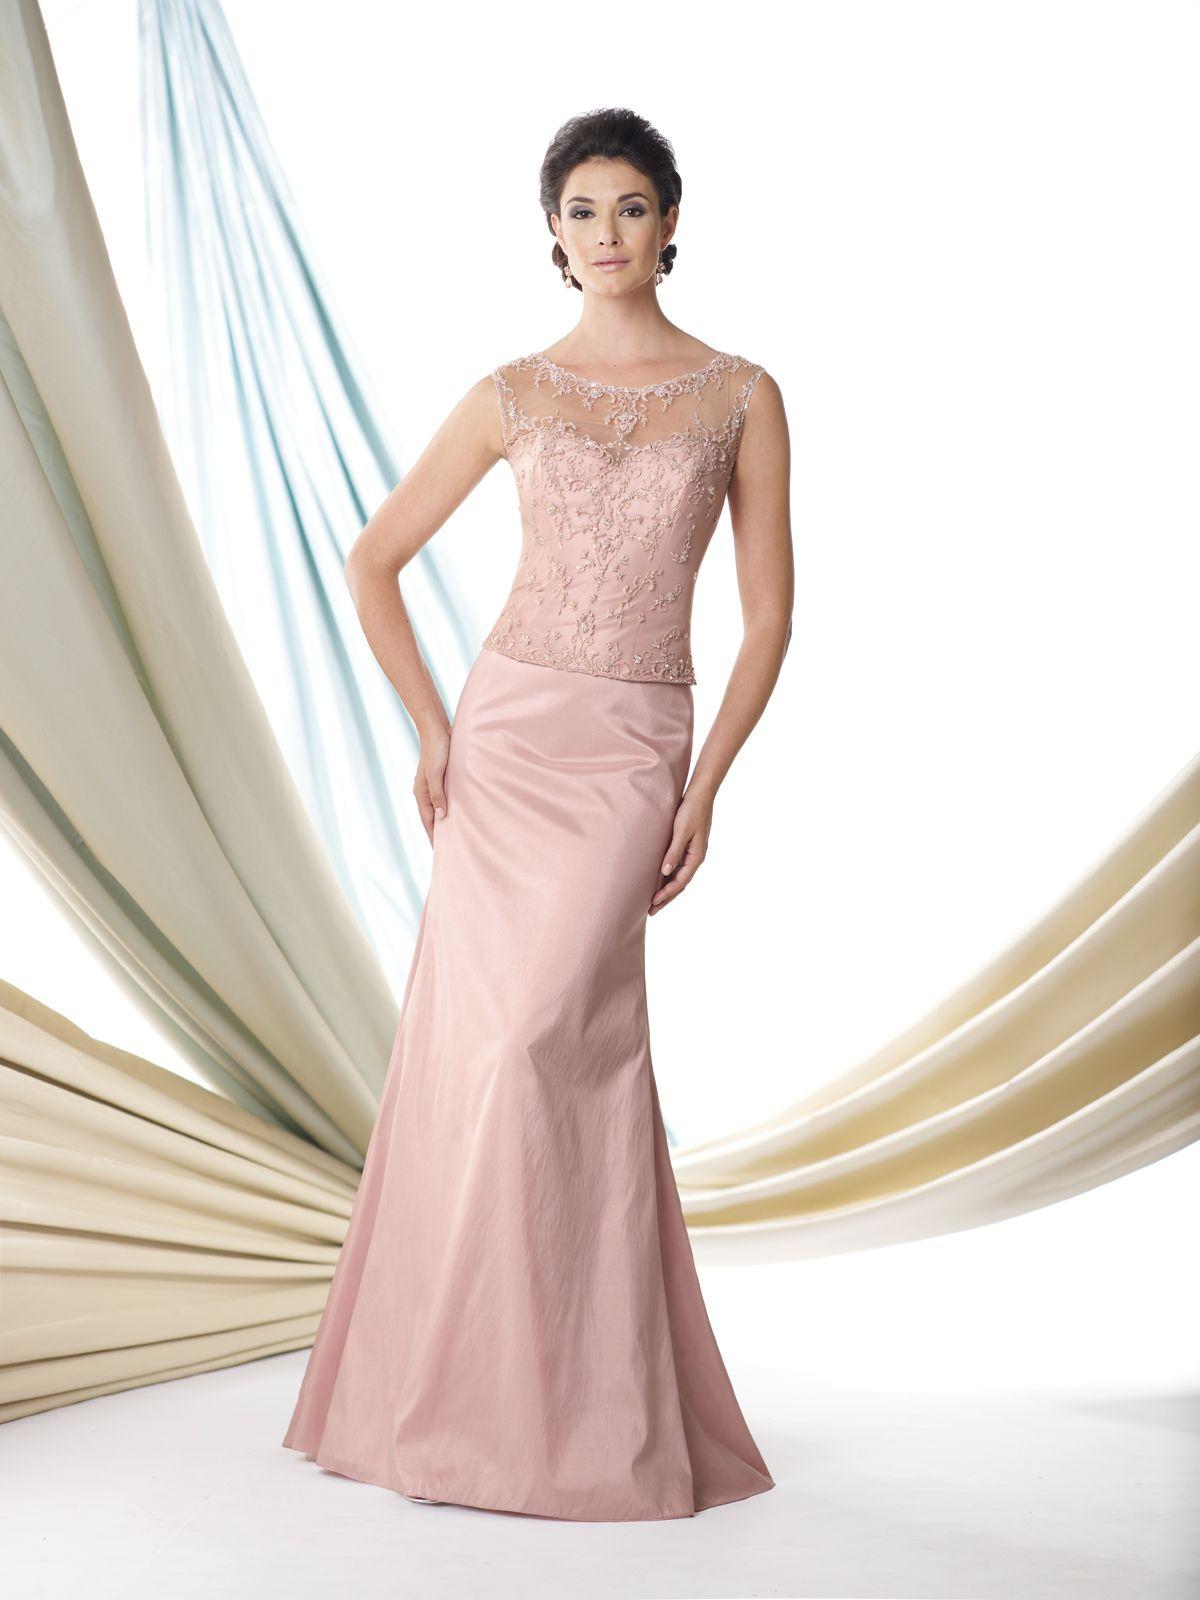 2018 Designer Wedding Dresses & Bridal Gowns | Pinterest | Vestidos ...